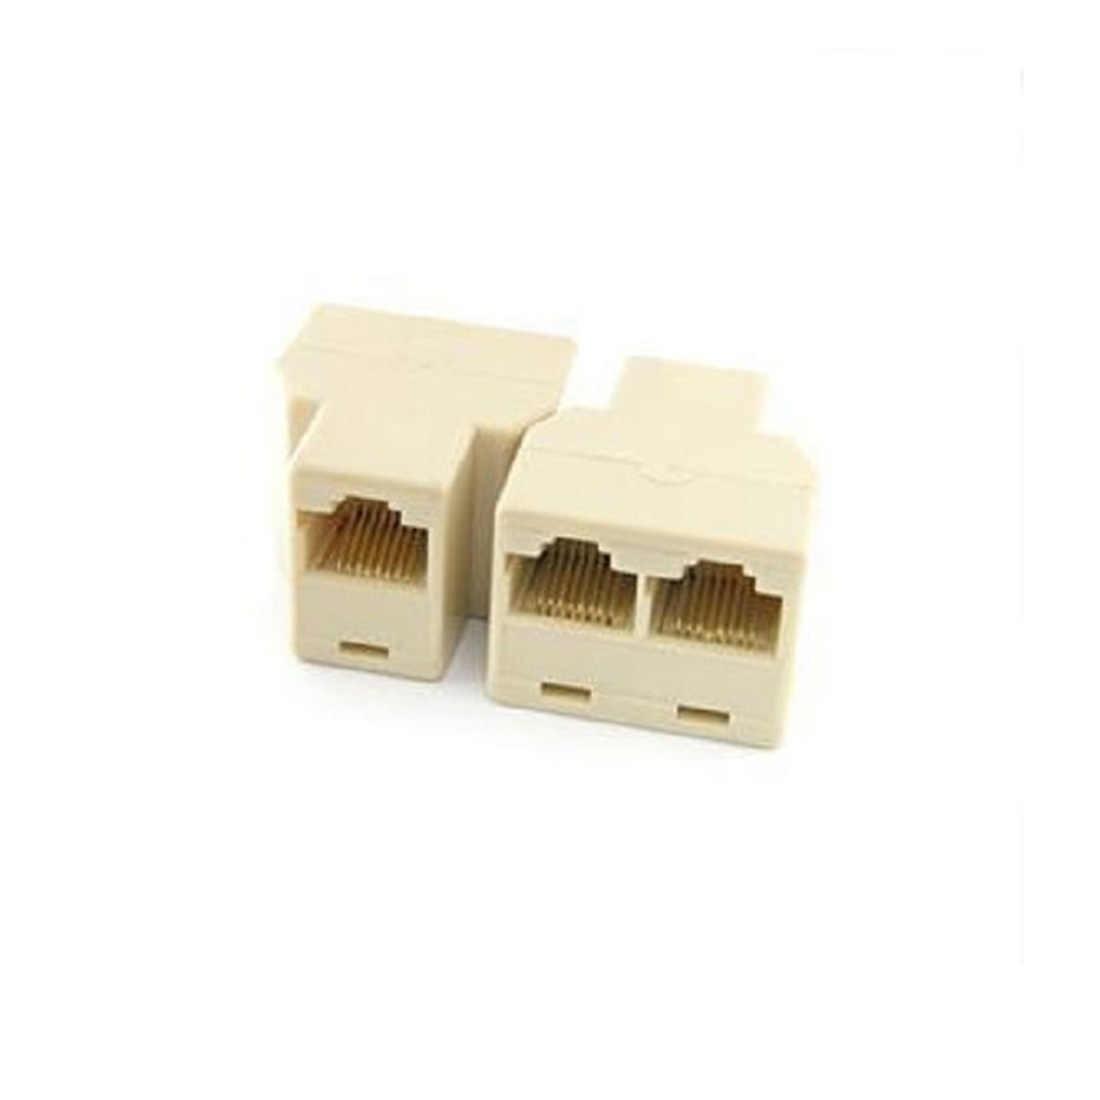 hot rj45 ethernet cable lan port 1 to 2 socket splitter rj45 splitter connector cat5 lan [ 1100 x 1100 Pixel ]